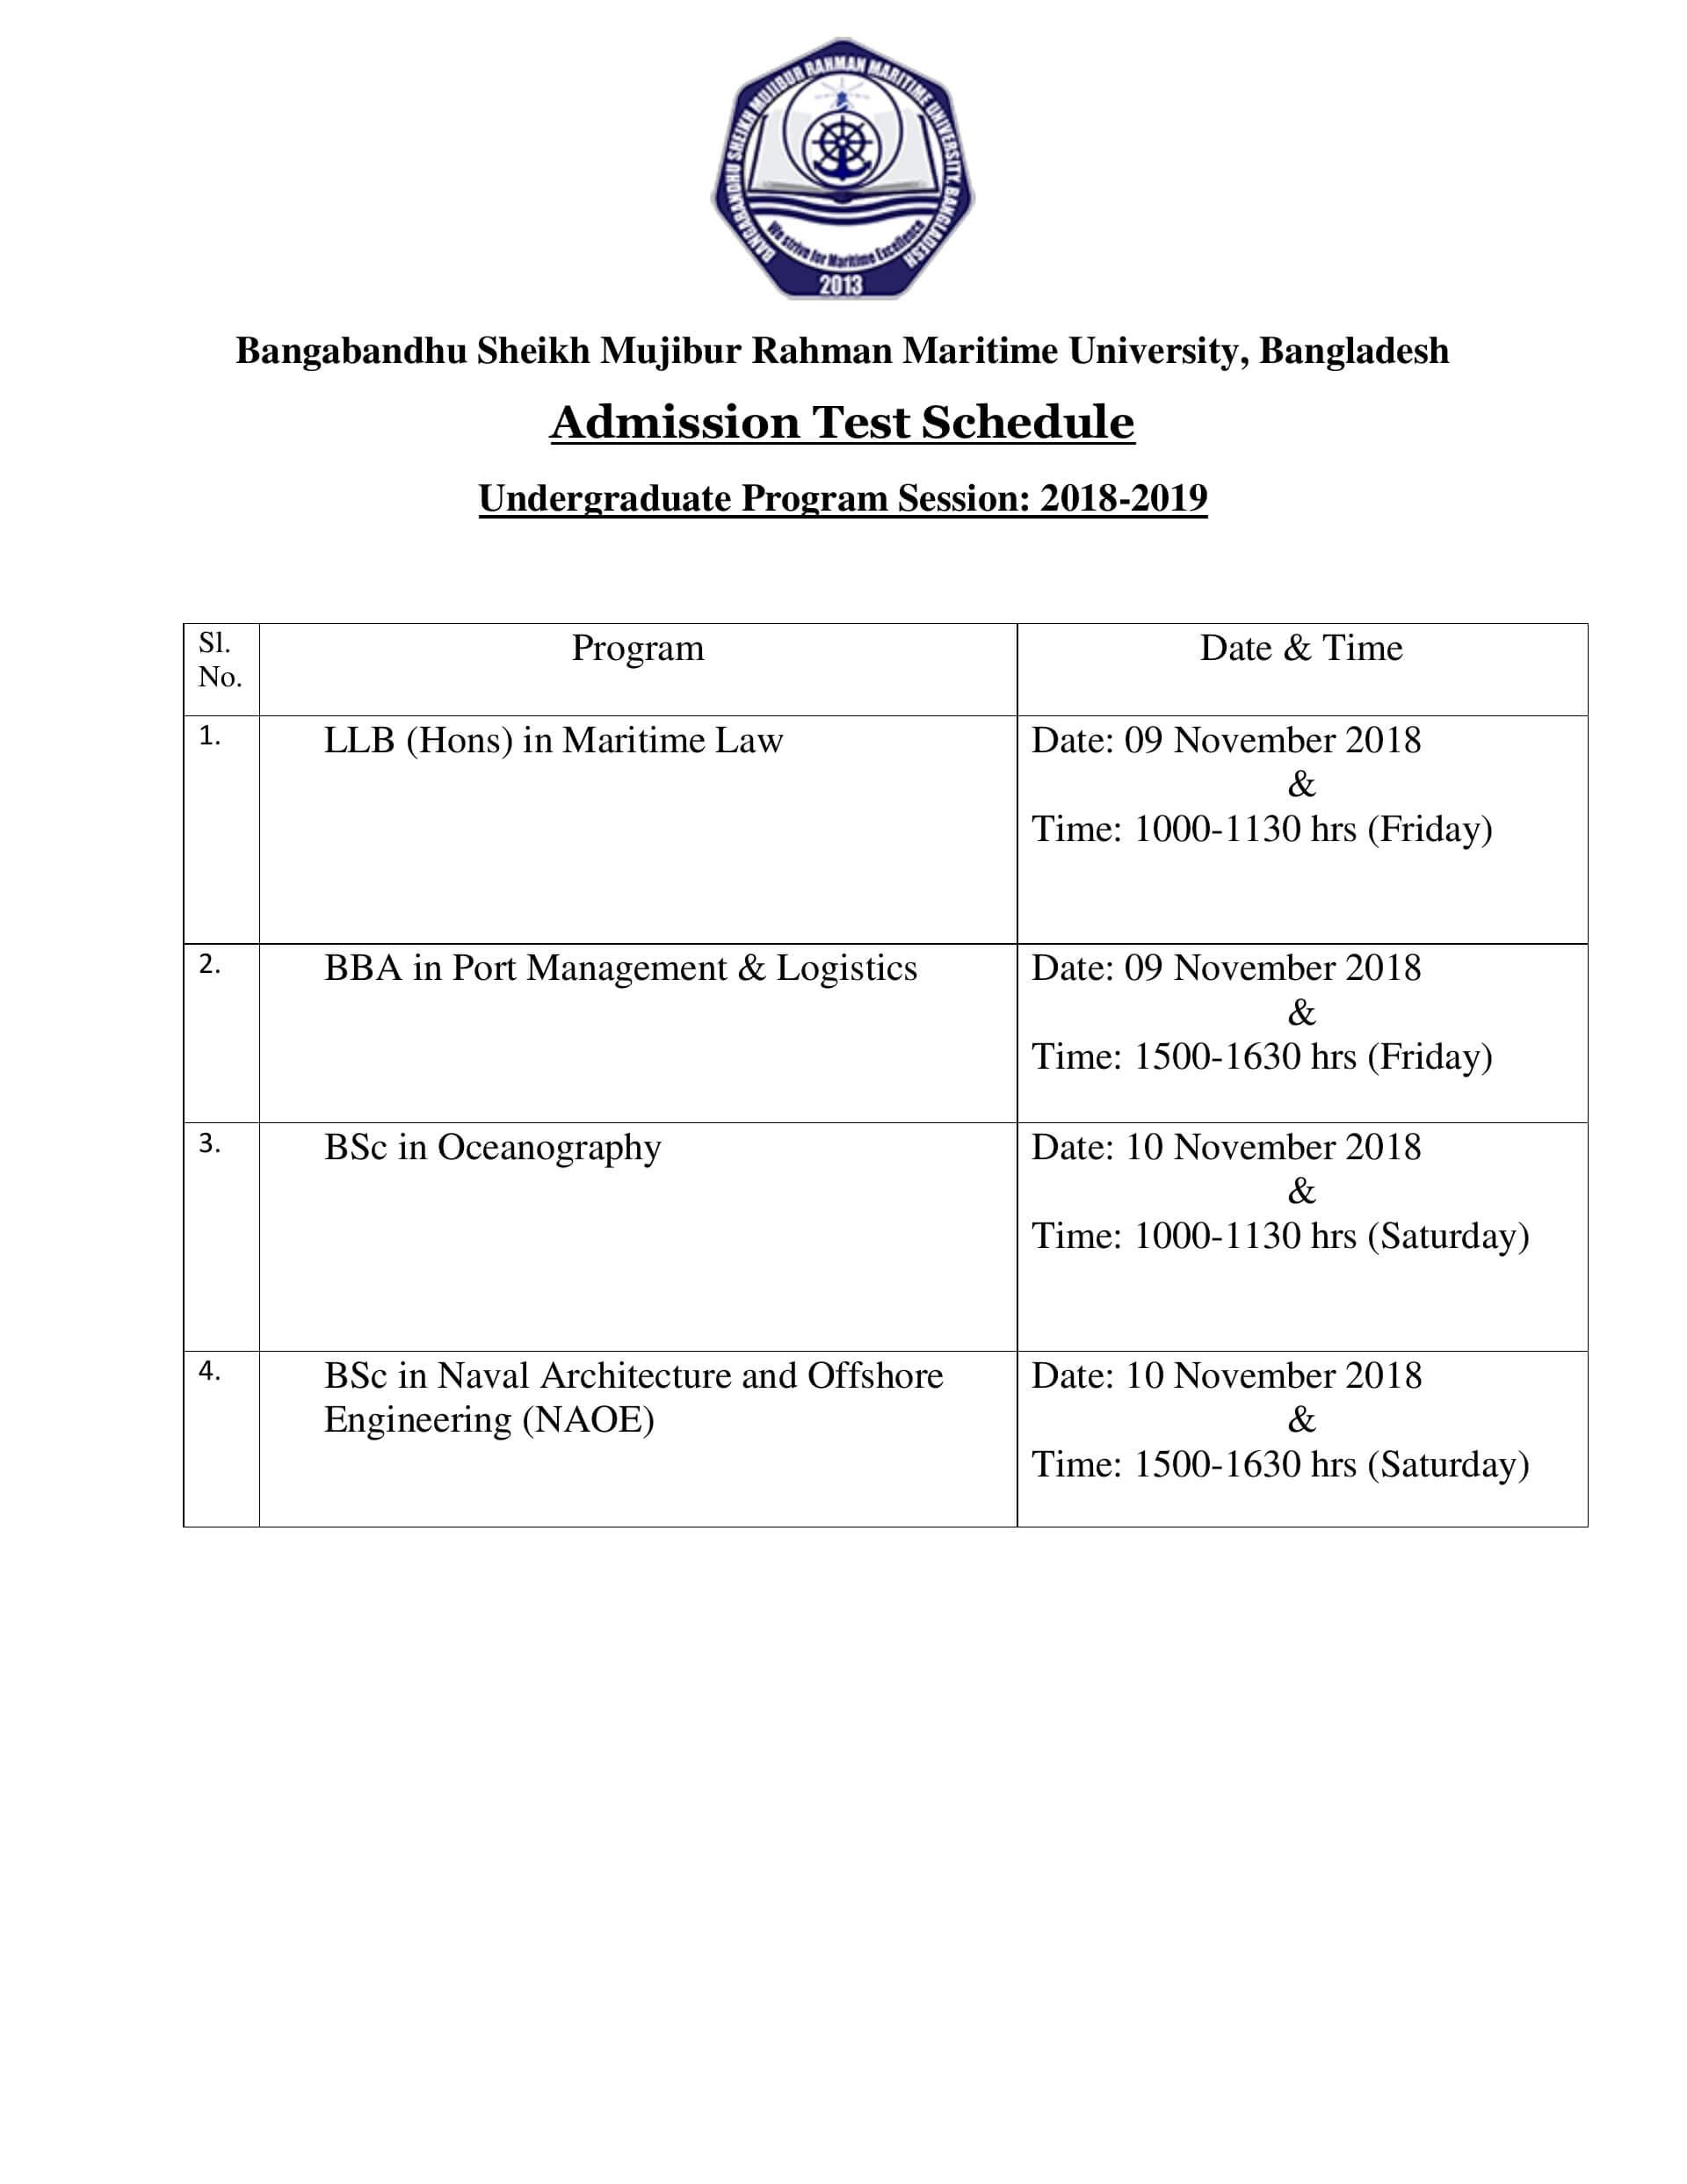 Bangabandhu Sheikh Mujibur Rahman maritime university Admission Schedule